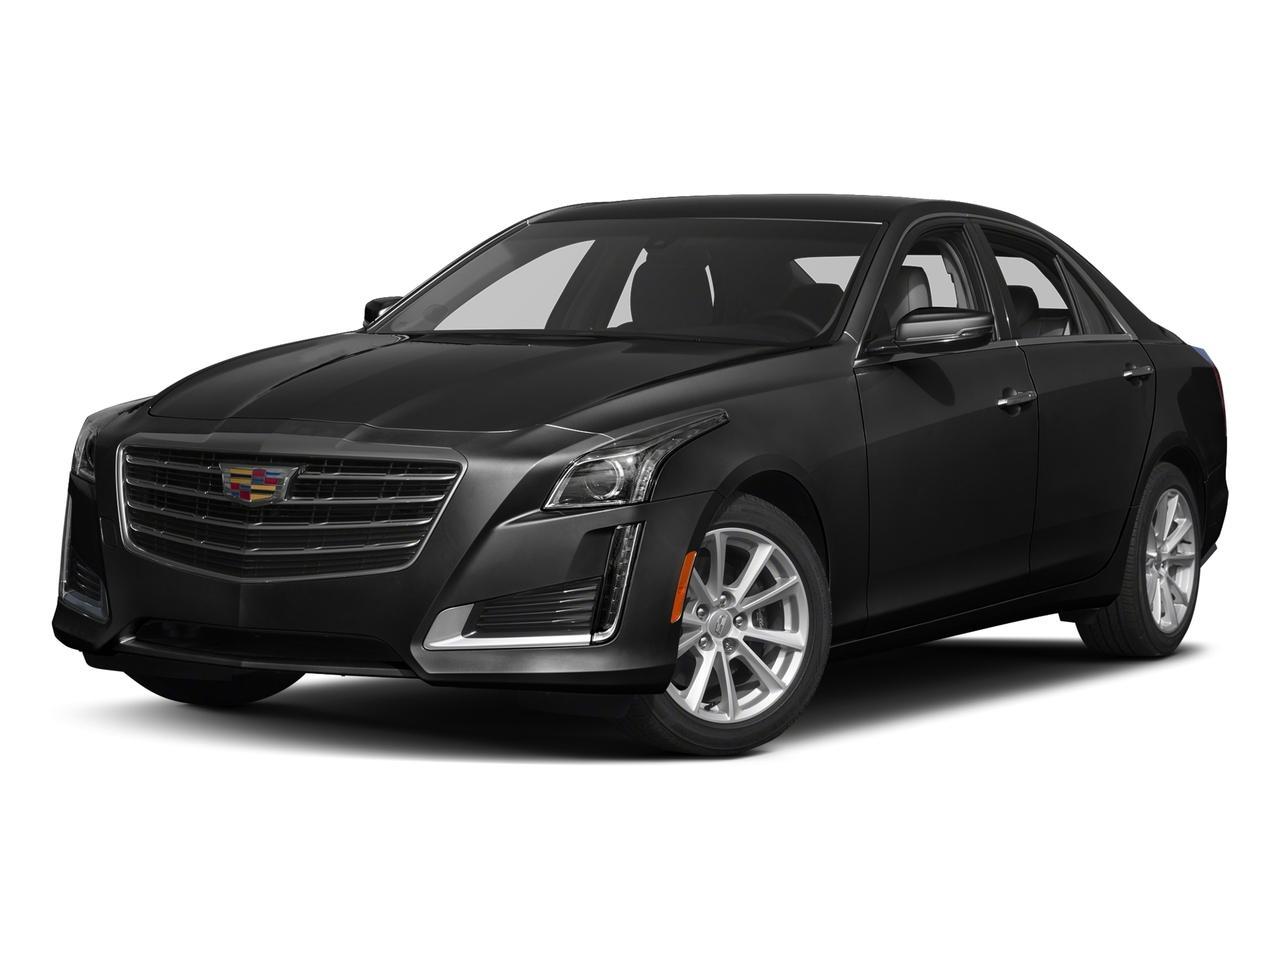 2018 Cadillac CTS Sedan Vehicle Photo in FRIENDSWOOD, TX 77546-2722